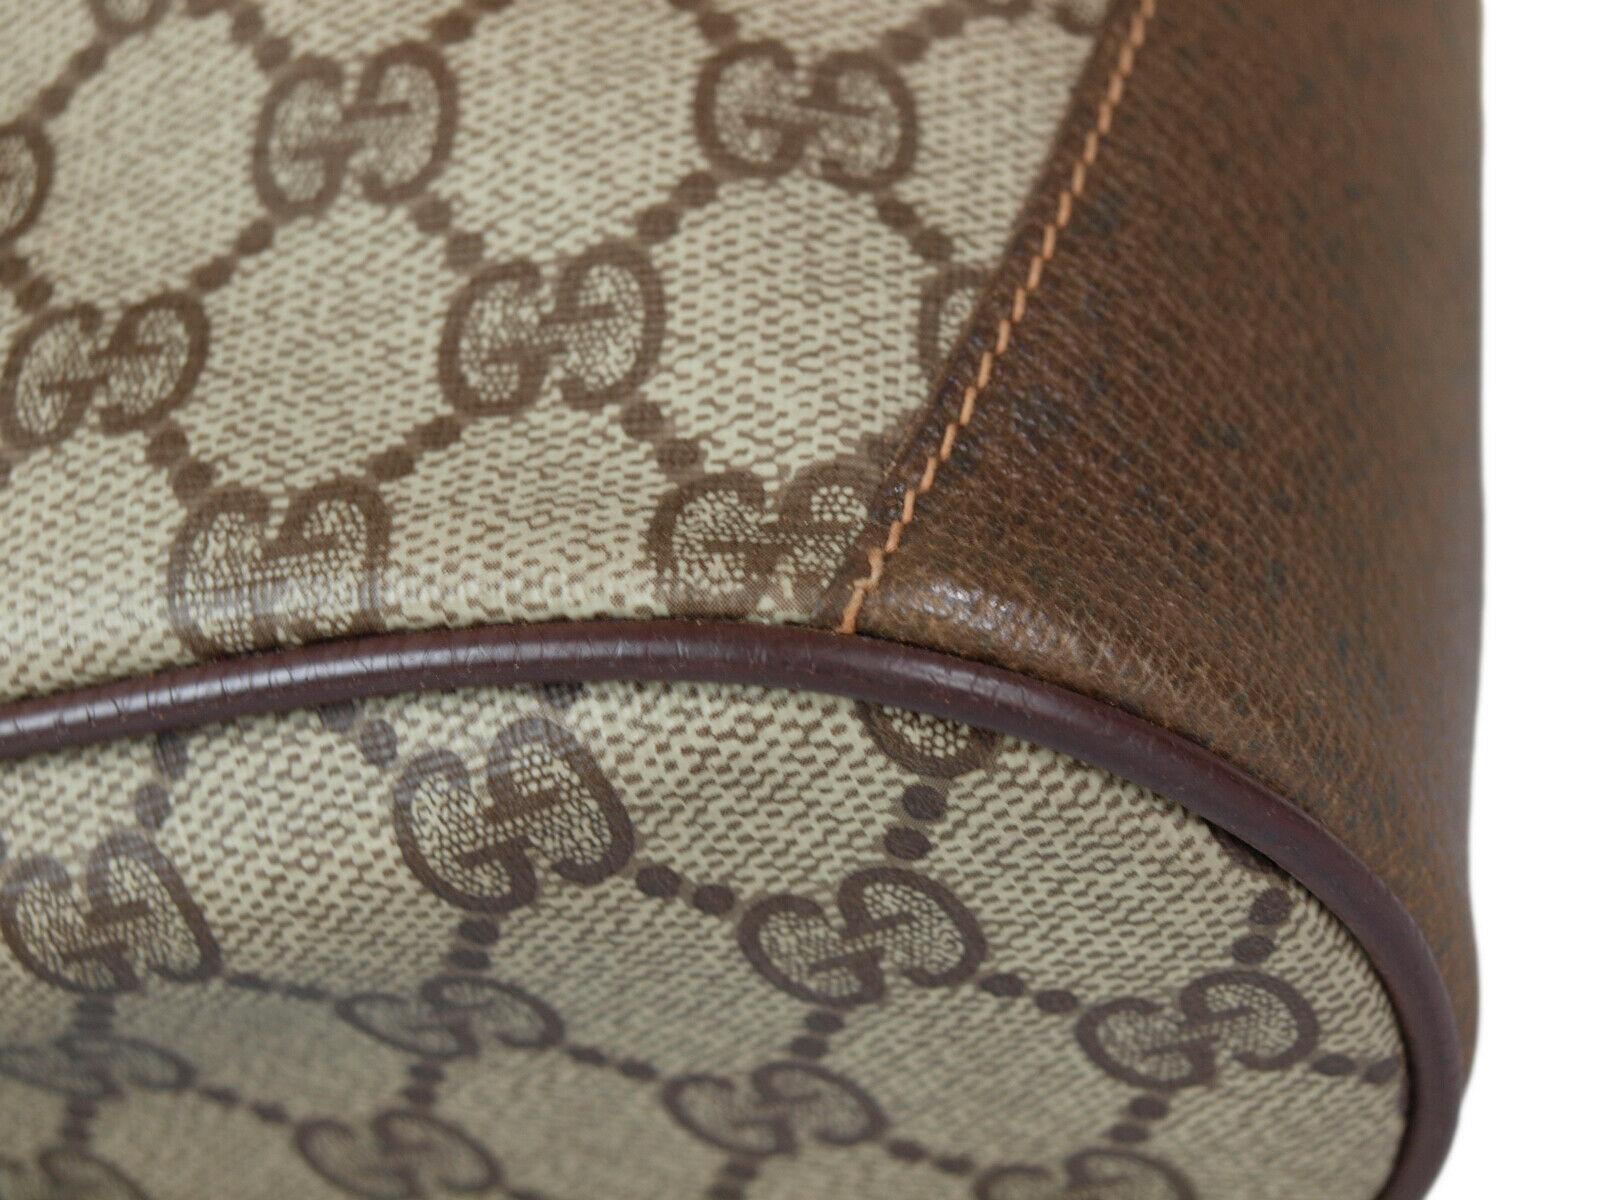 GUCCI GG Web PVC Canvas Leather Browns Drawstring Shoulder Bag GS2171 image 5